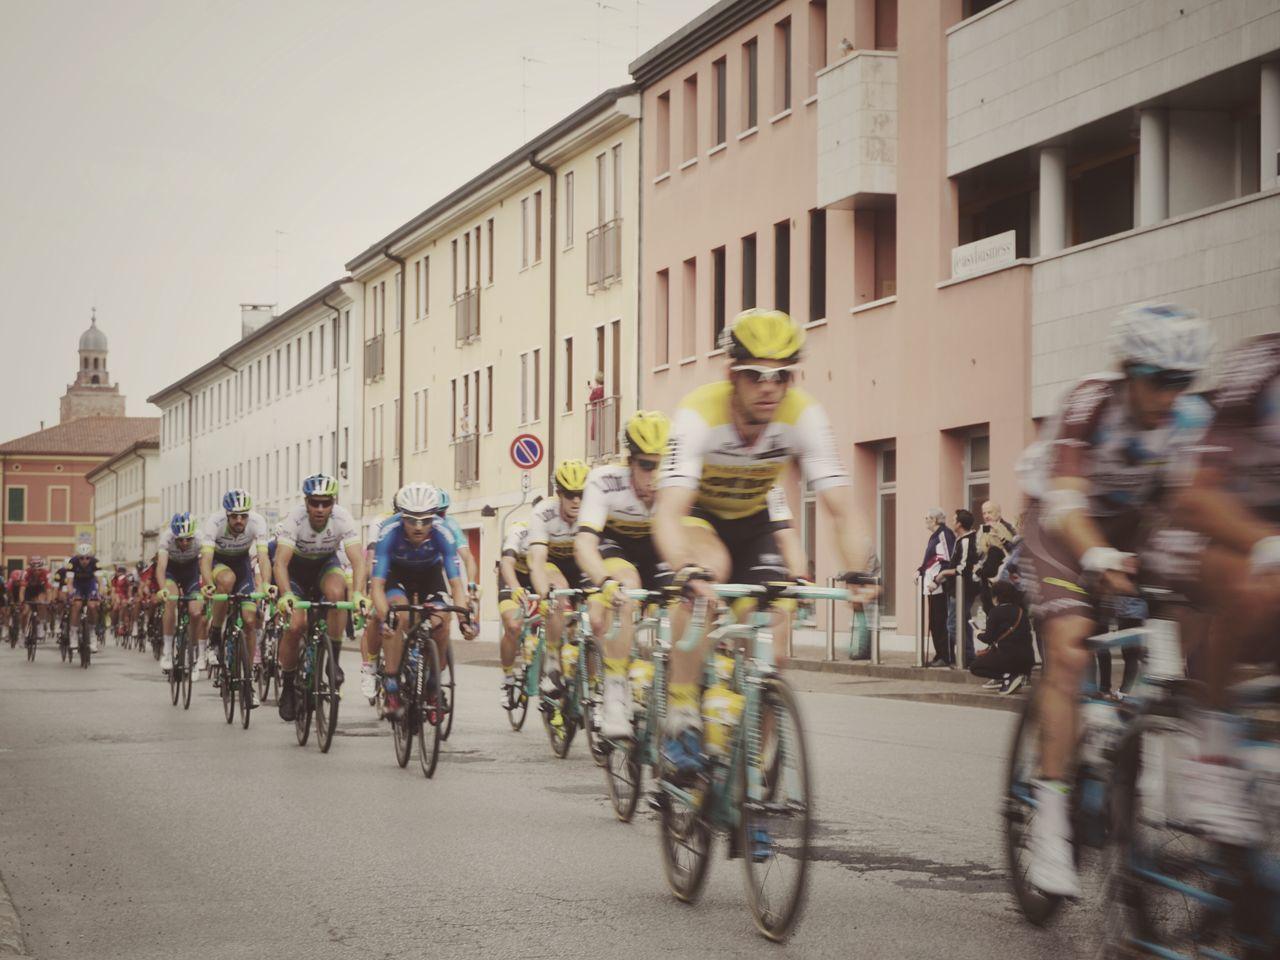 Giro d'Italia around my town   Bicycles Cyclists Getting Inspired The Street Photographer - 2016 EyeEm Awards Giro D'Italia 2016 Castelfranco Veneto EyeEm Italy  